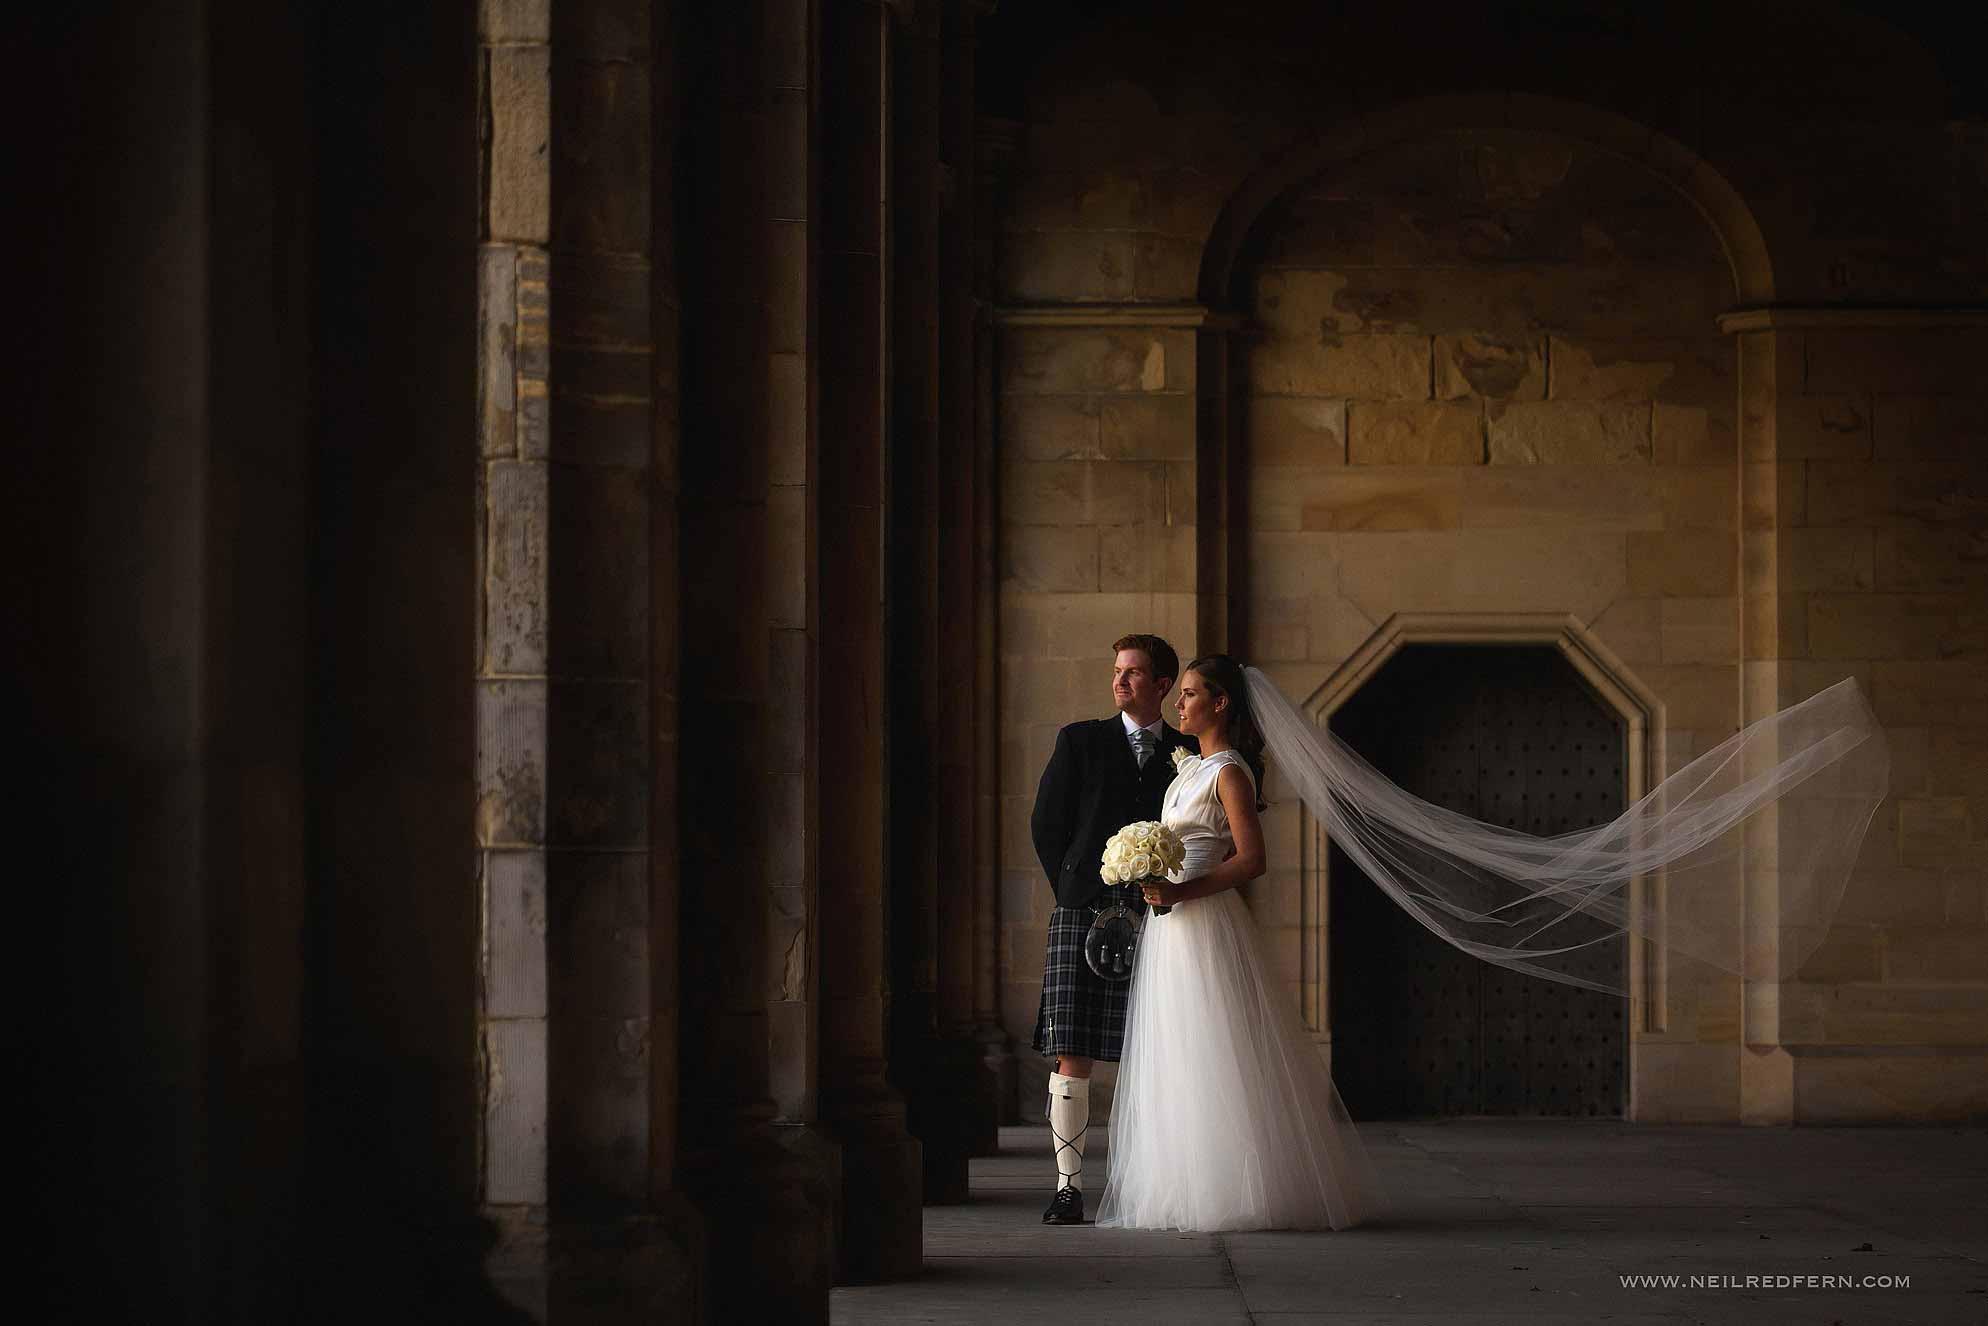 st-andrews-wedding-photograph-20